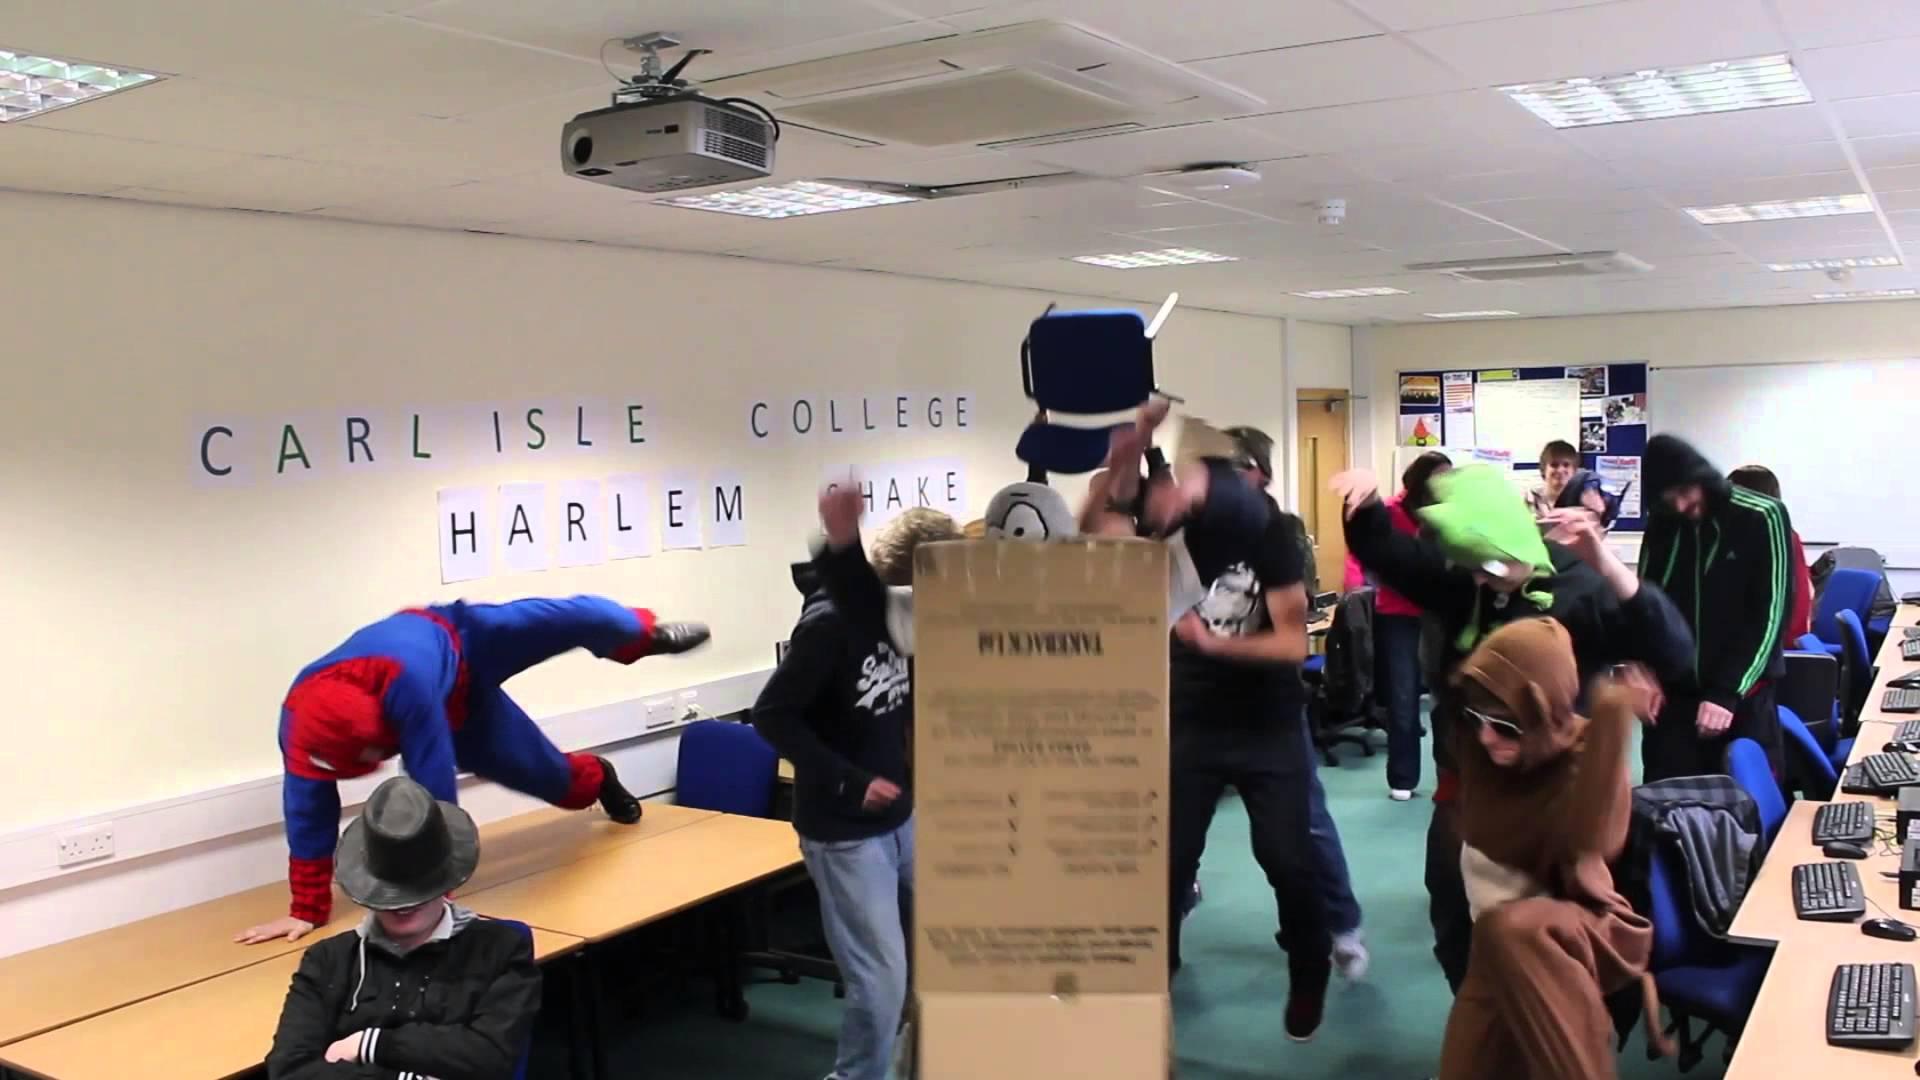 Carlisle College